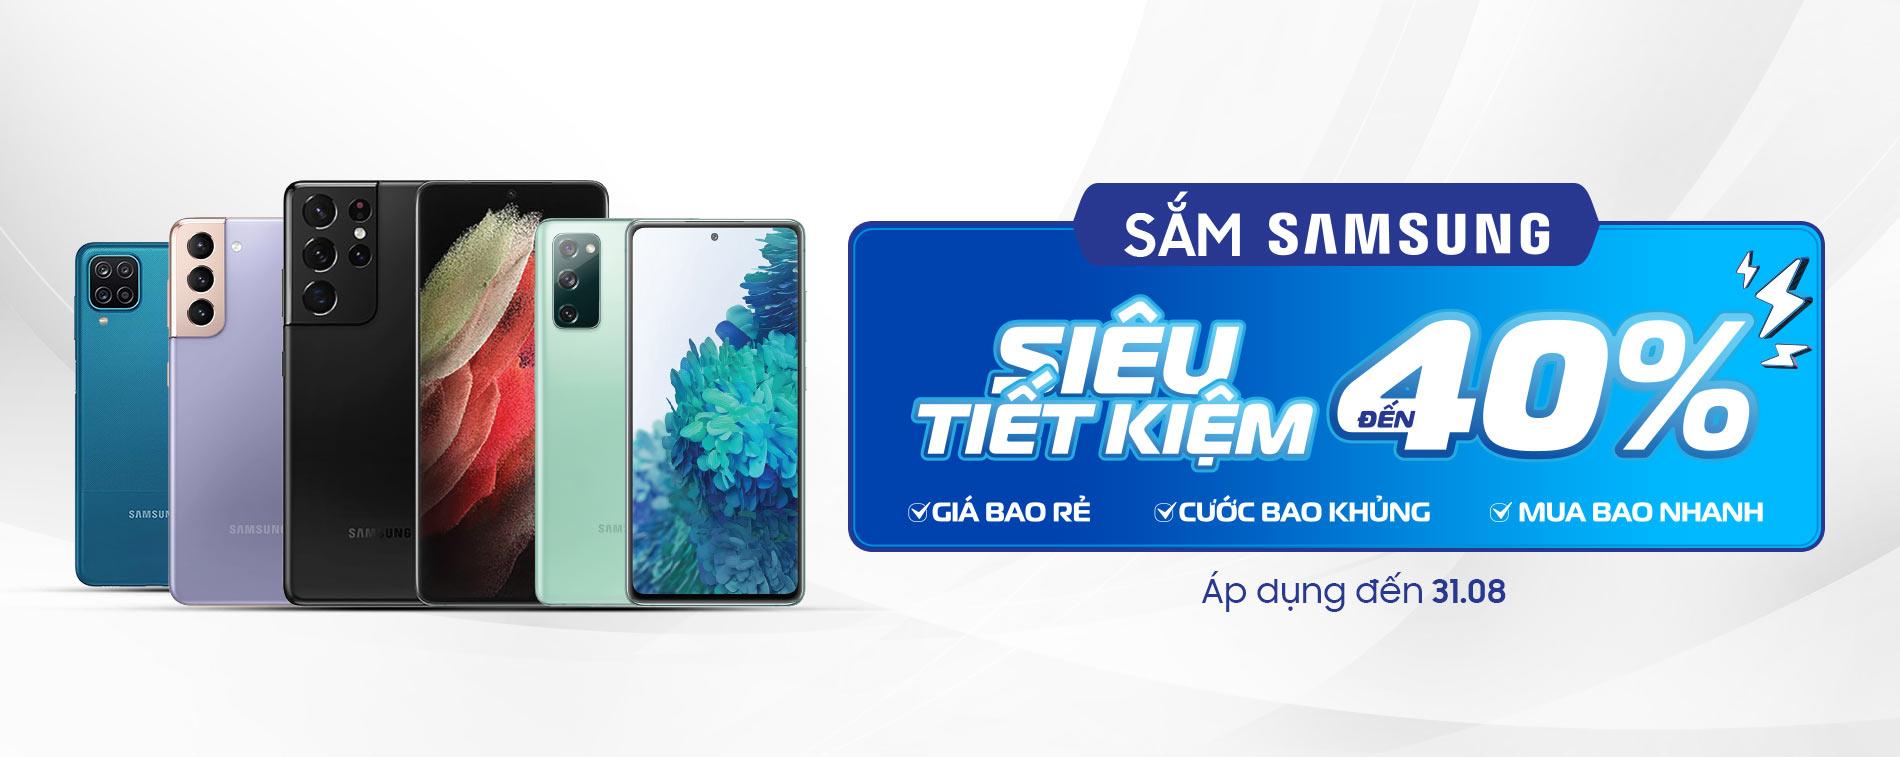 Mua Samsung siêu tiết kiệm đến 40%